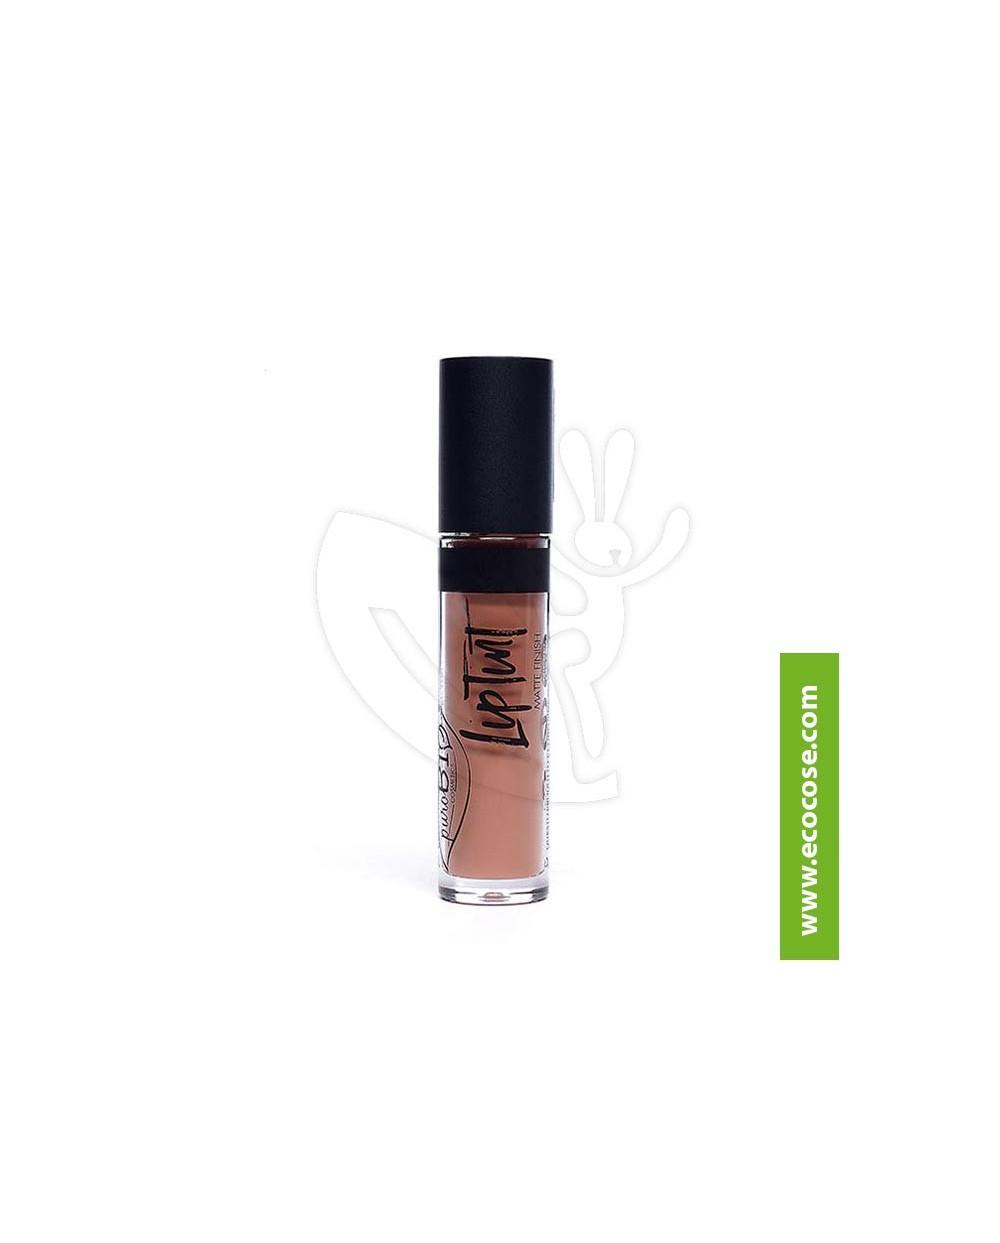 PuroBIO Cosmetics - LipTint 01 - Nude